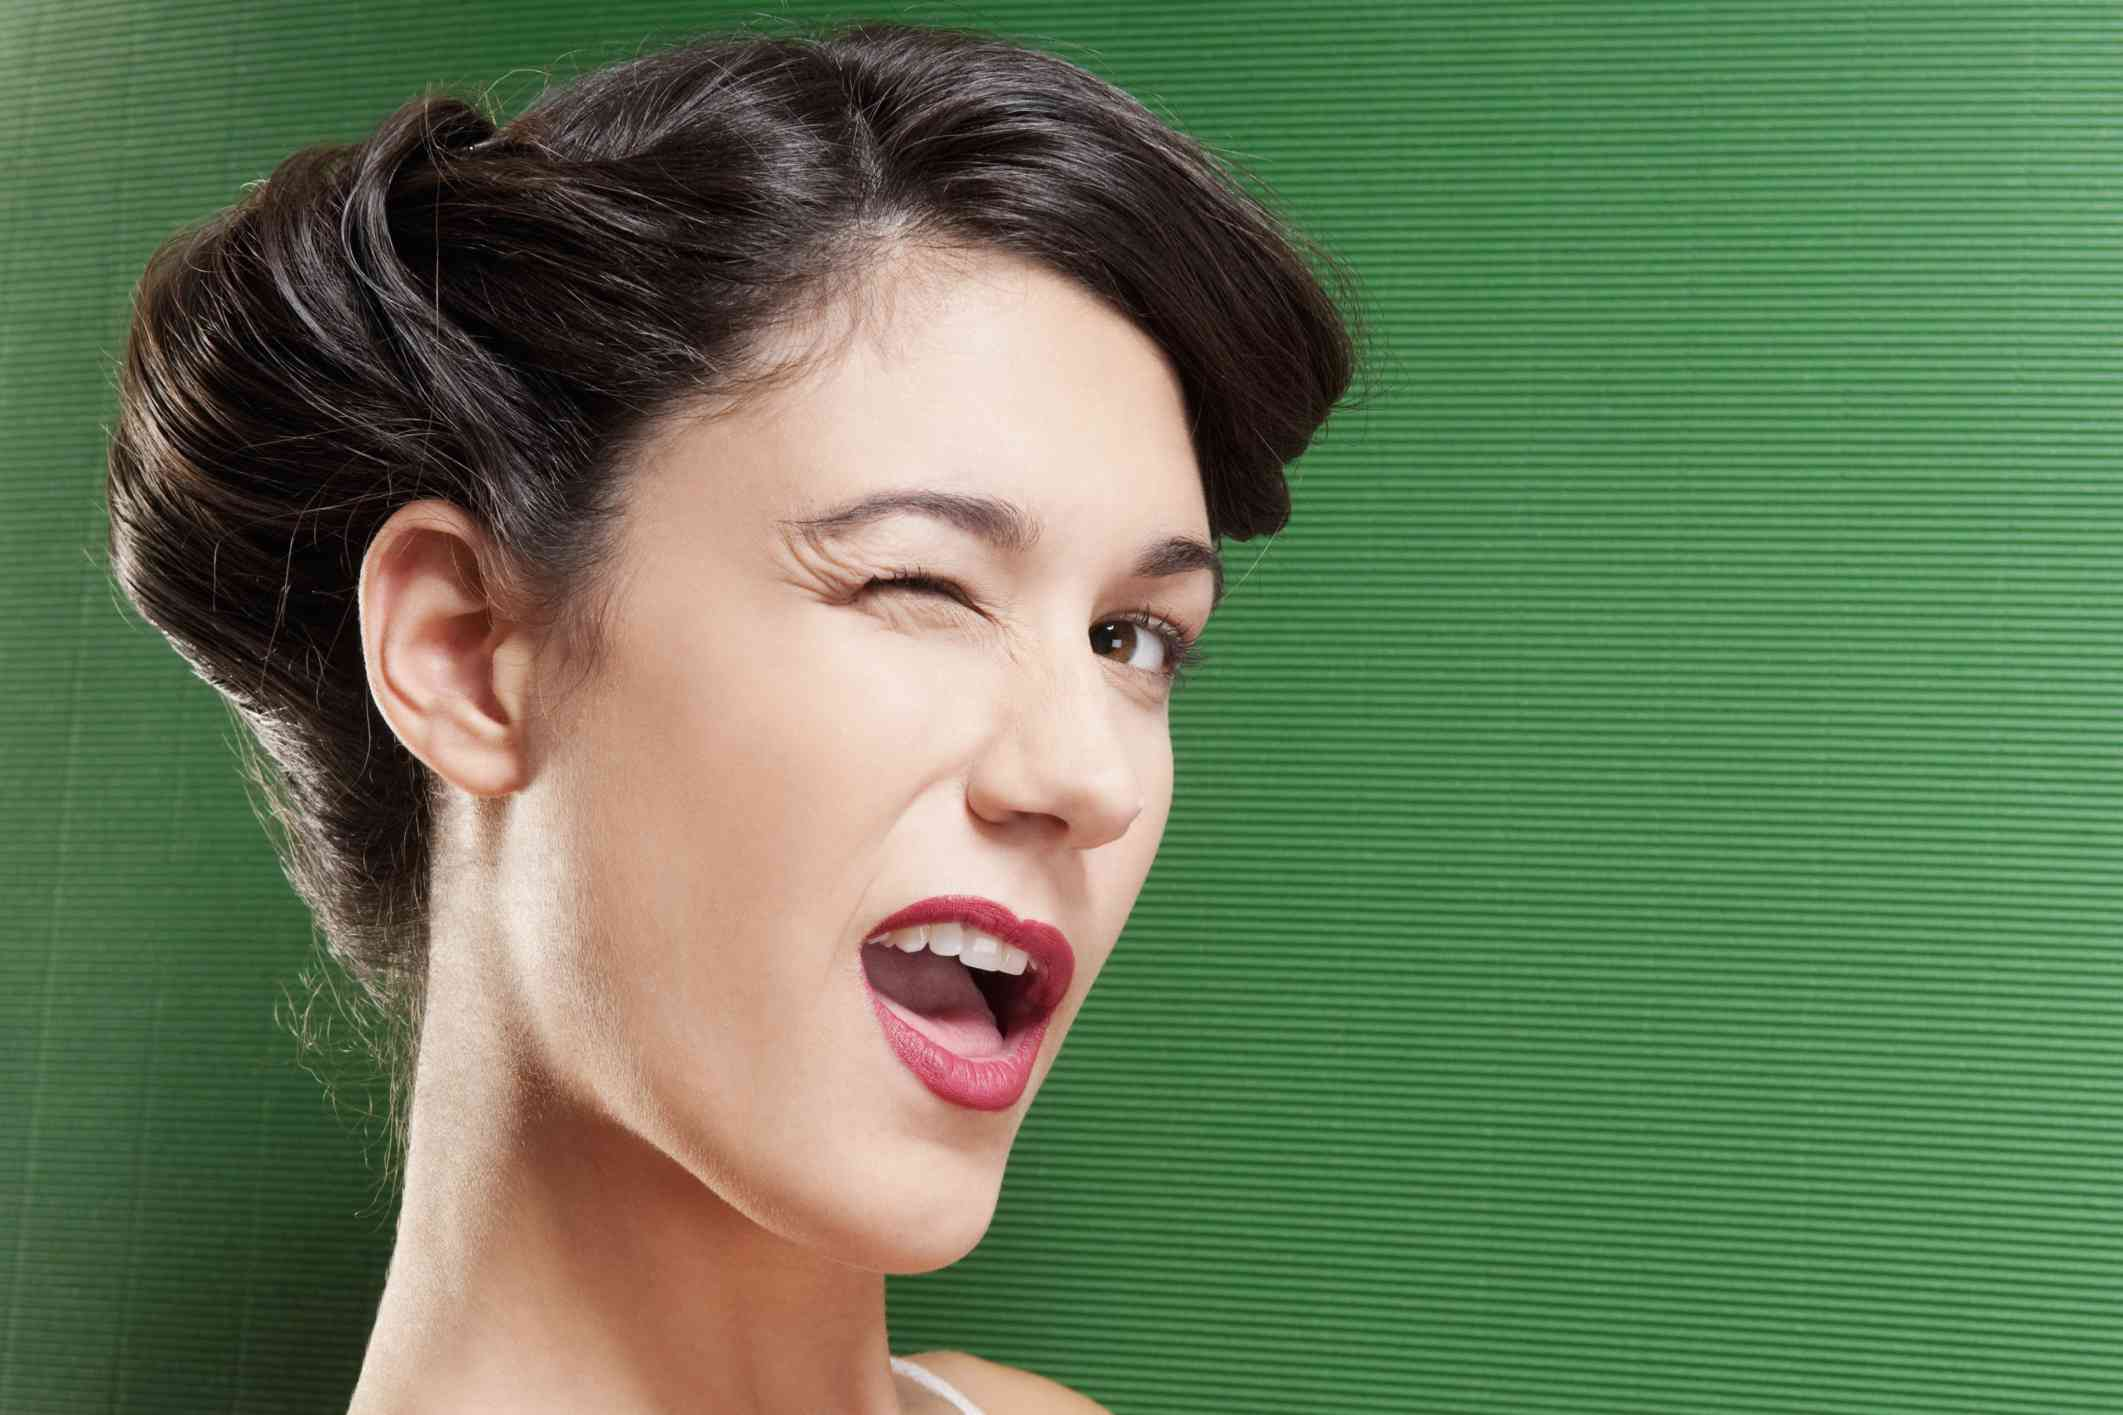 A woman winking